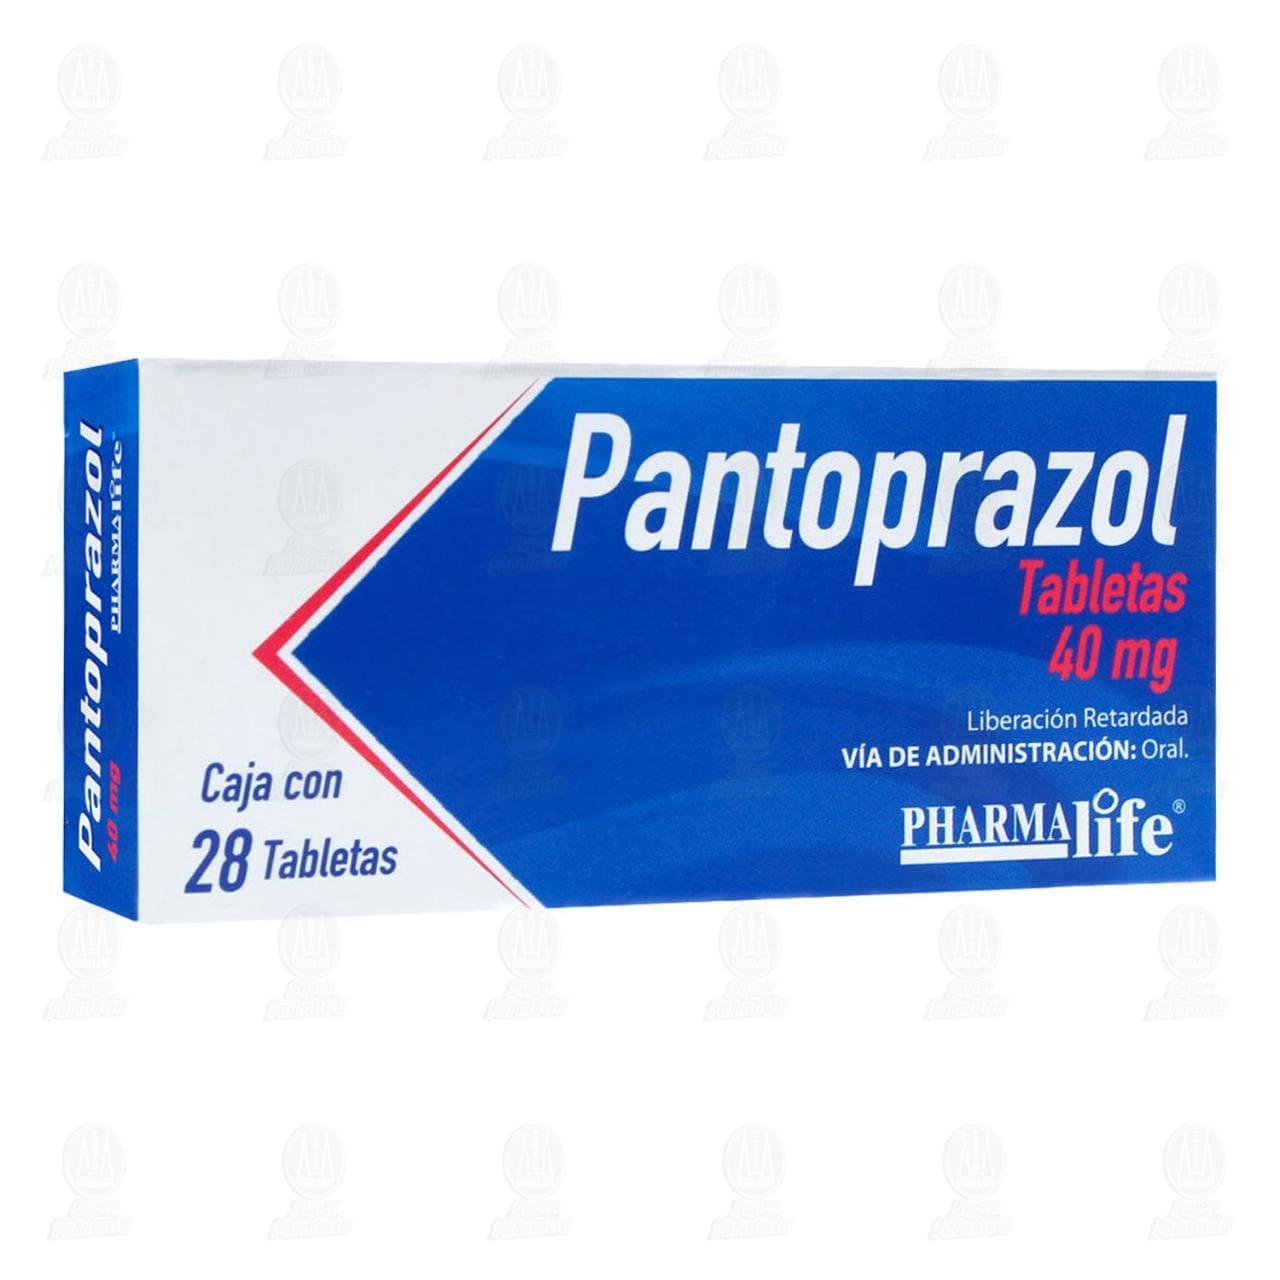 Comprar Pantoprazol 40mg 28 Tabletas Pharmalife en Farmacias Guadalajara